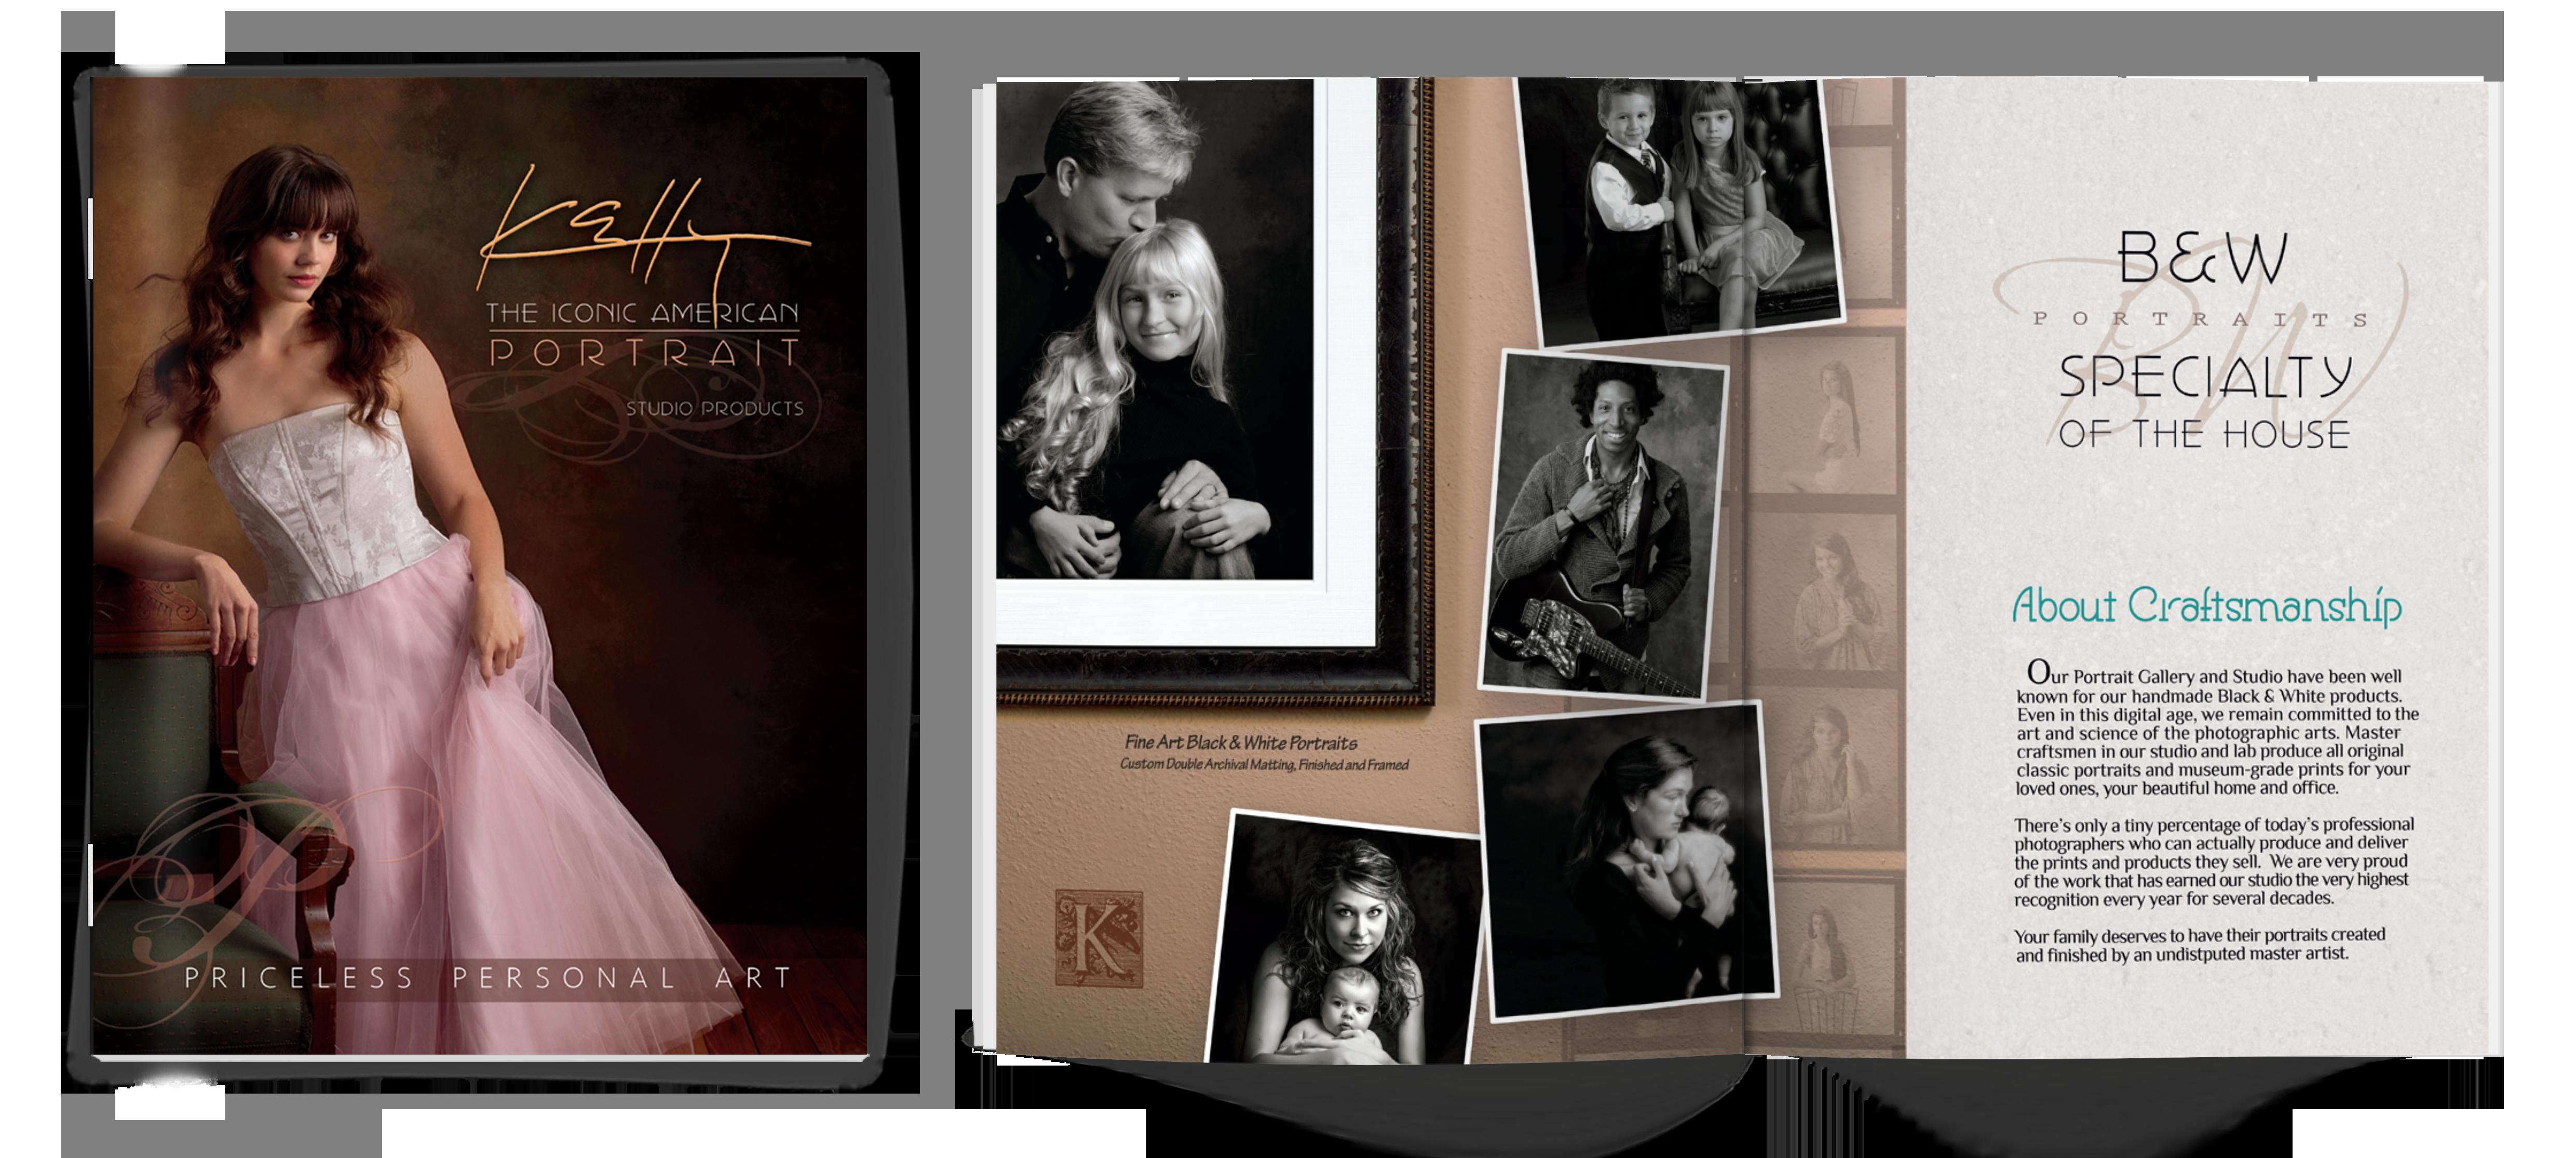 205884_tim_kelly_portrait_booklet2.png